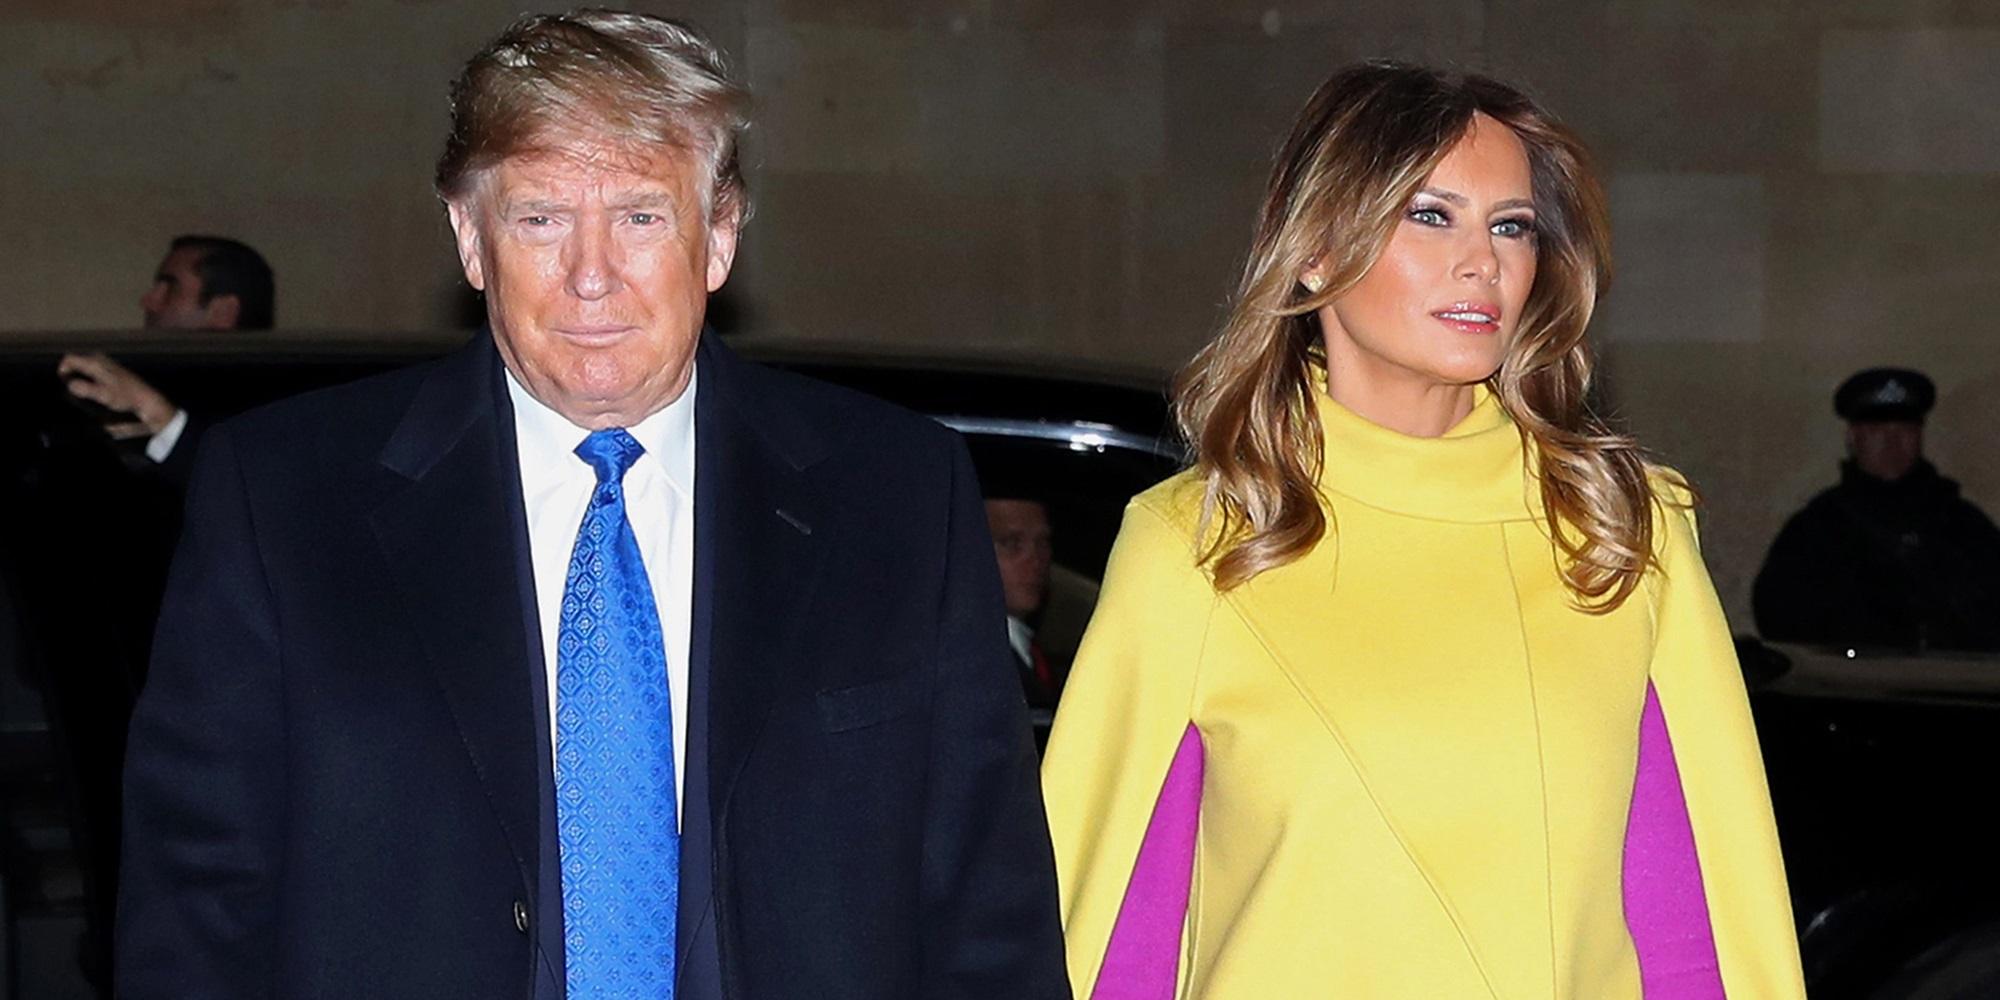 Donald Trump Melania Barron Pamela Karlan Joke